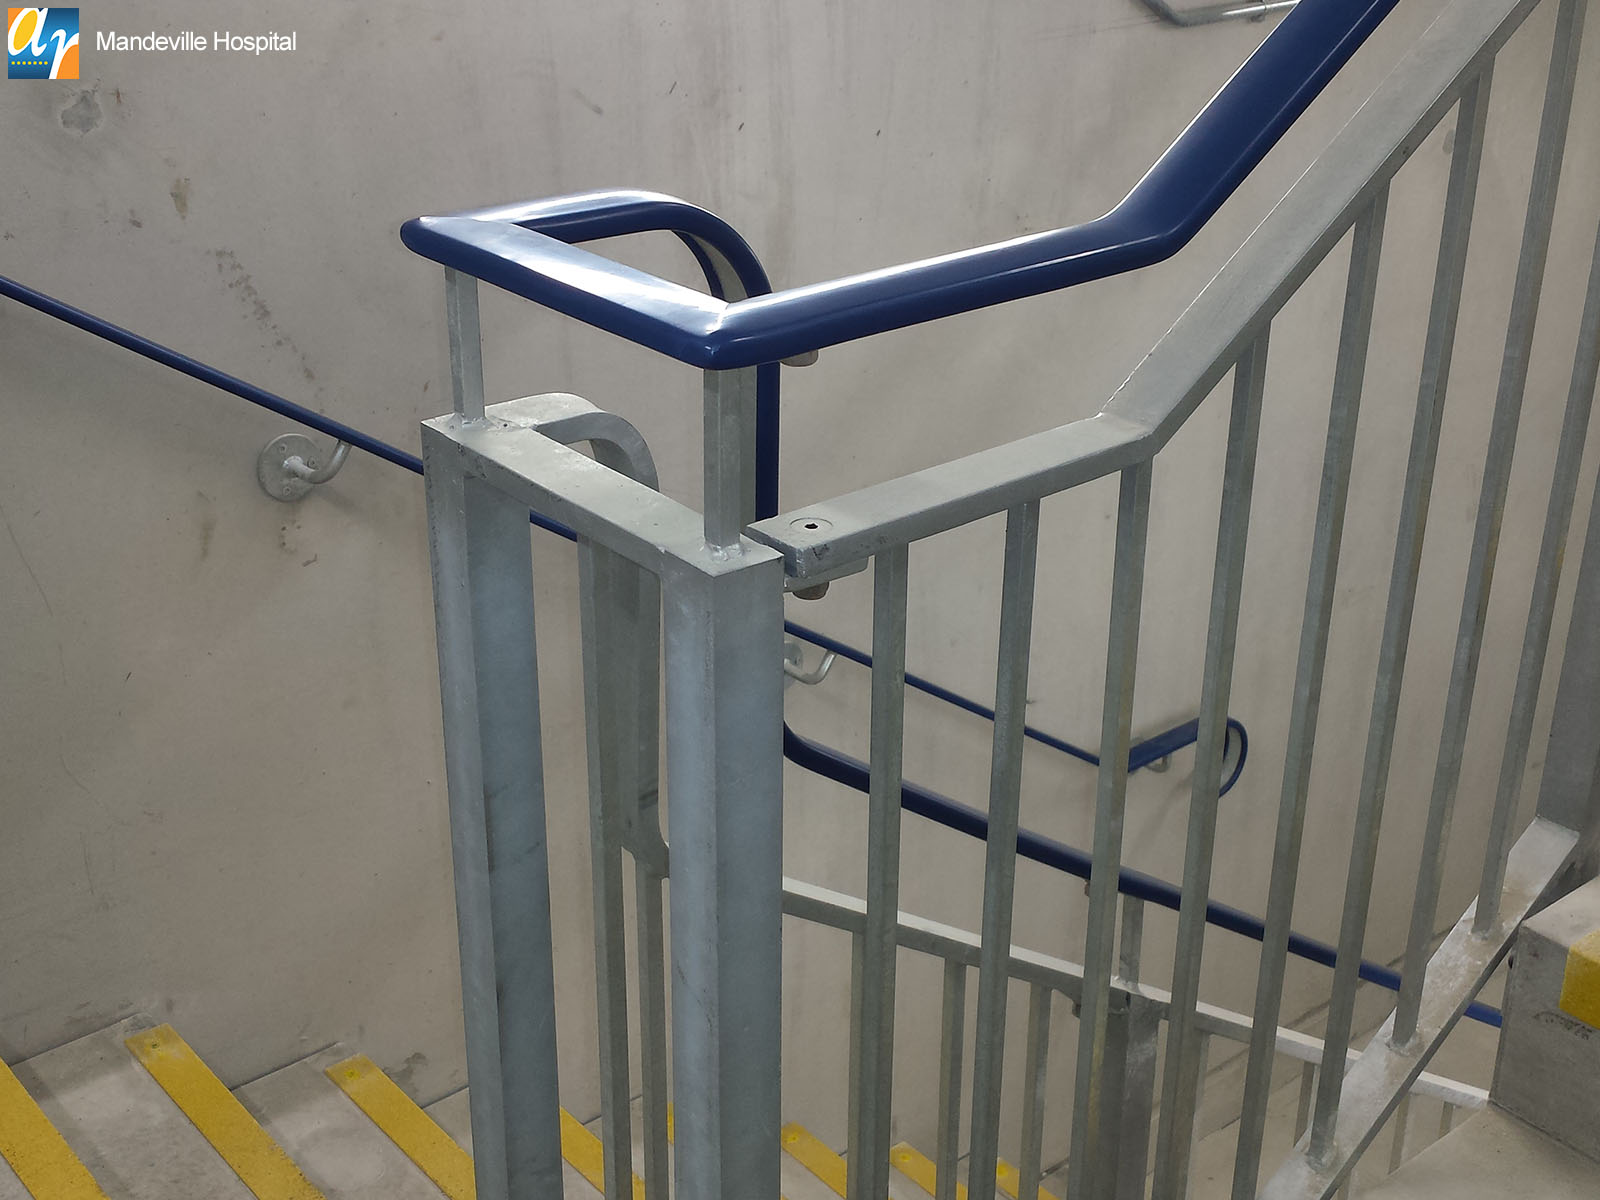 Mandeville hospital stair railings